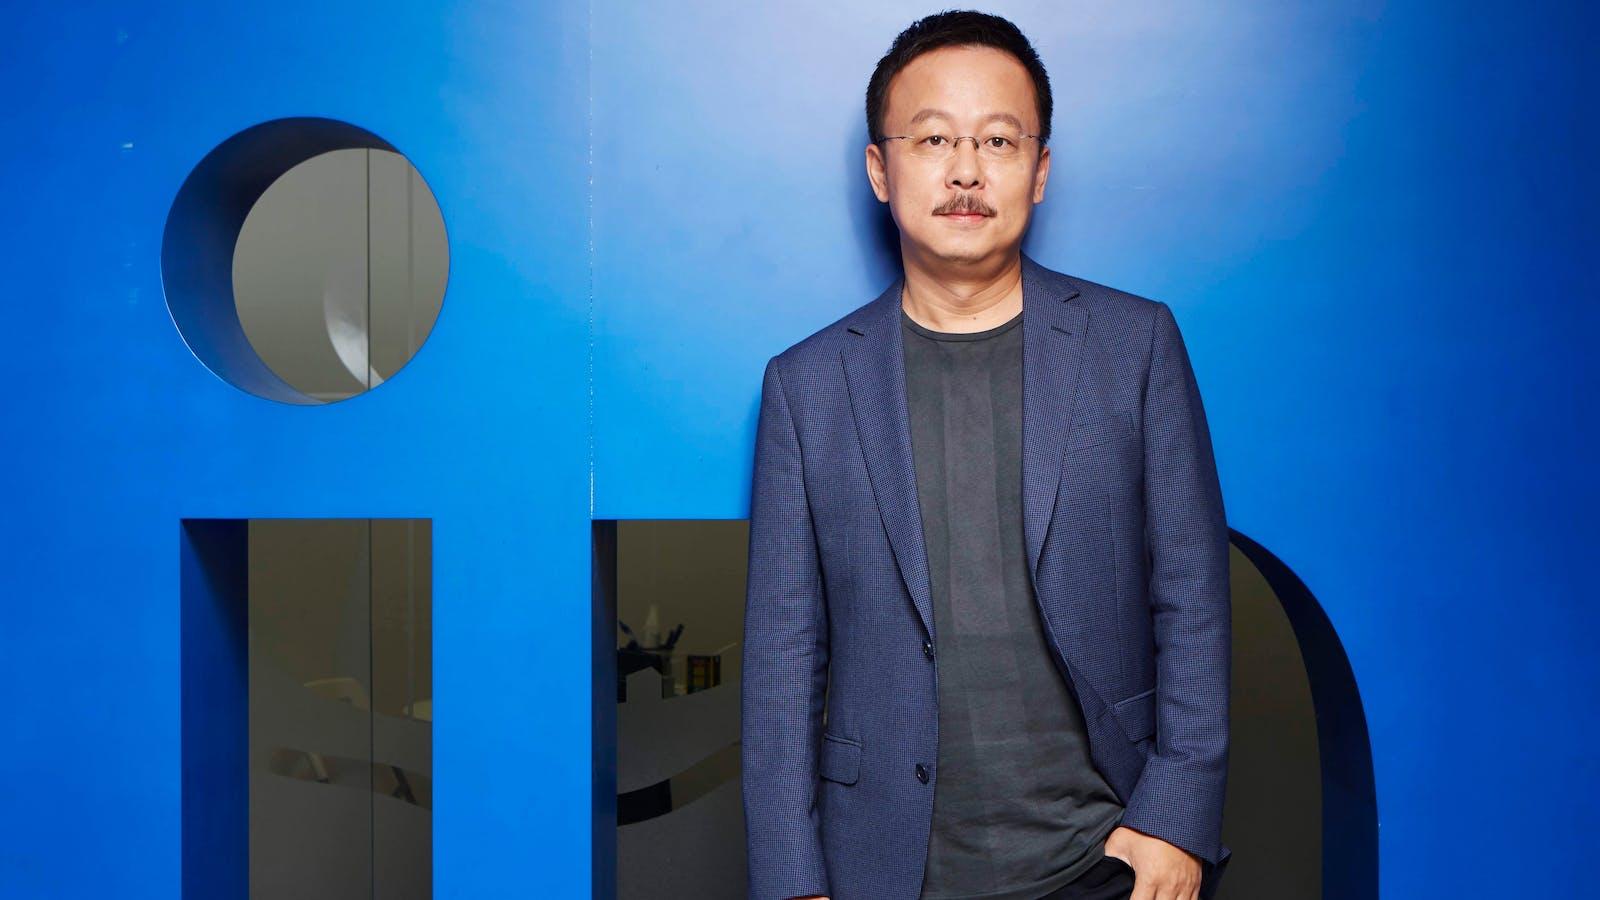 LinkedIn China's chief Derek Shen. Photo by LinkedIn.